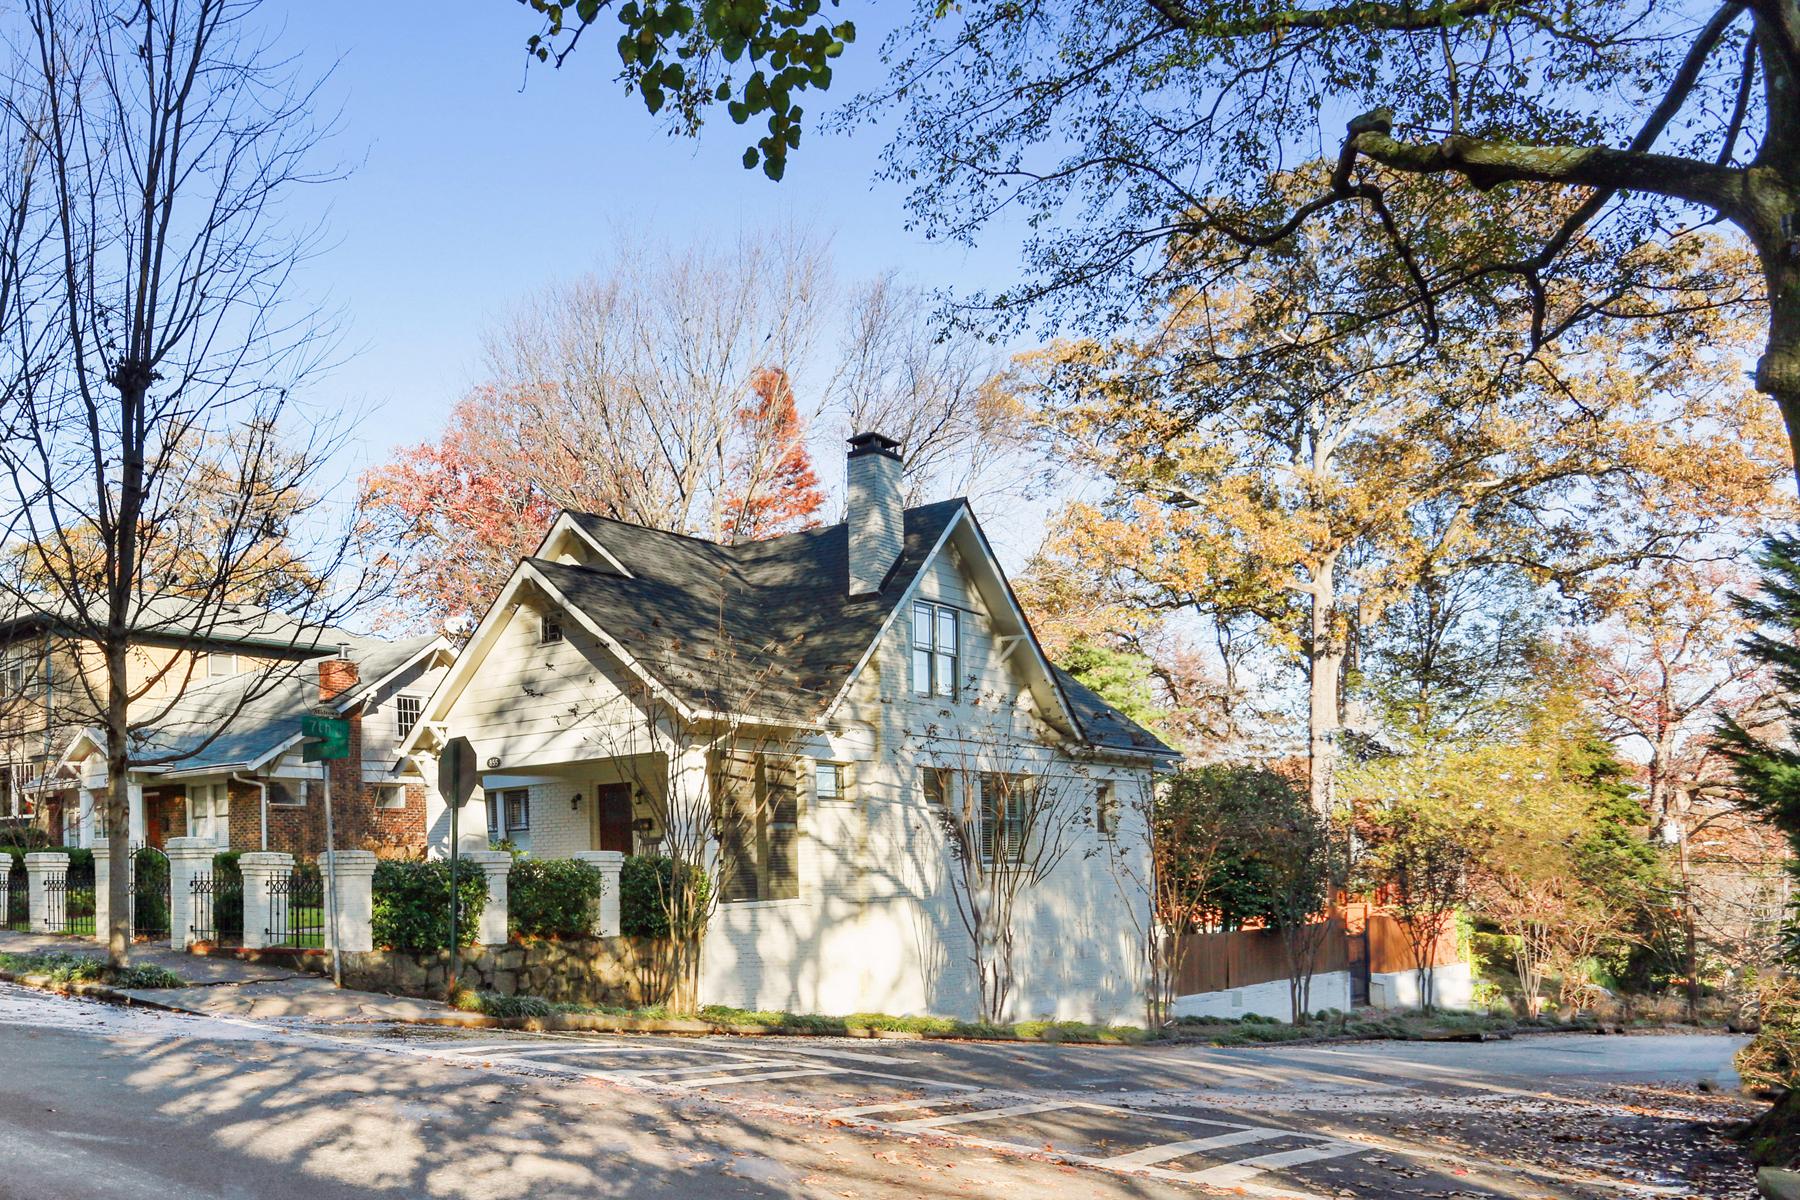 Single Family Home for Active at Prettiest Craftsman Bungalow in Piedmont Park 855 Argonne Avenue NE Atlanta, Georgia 30308 United States